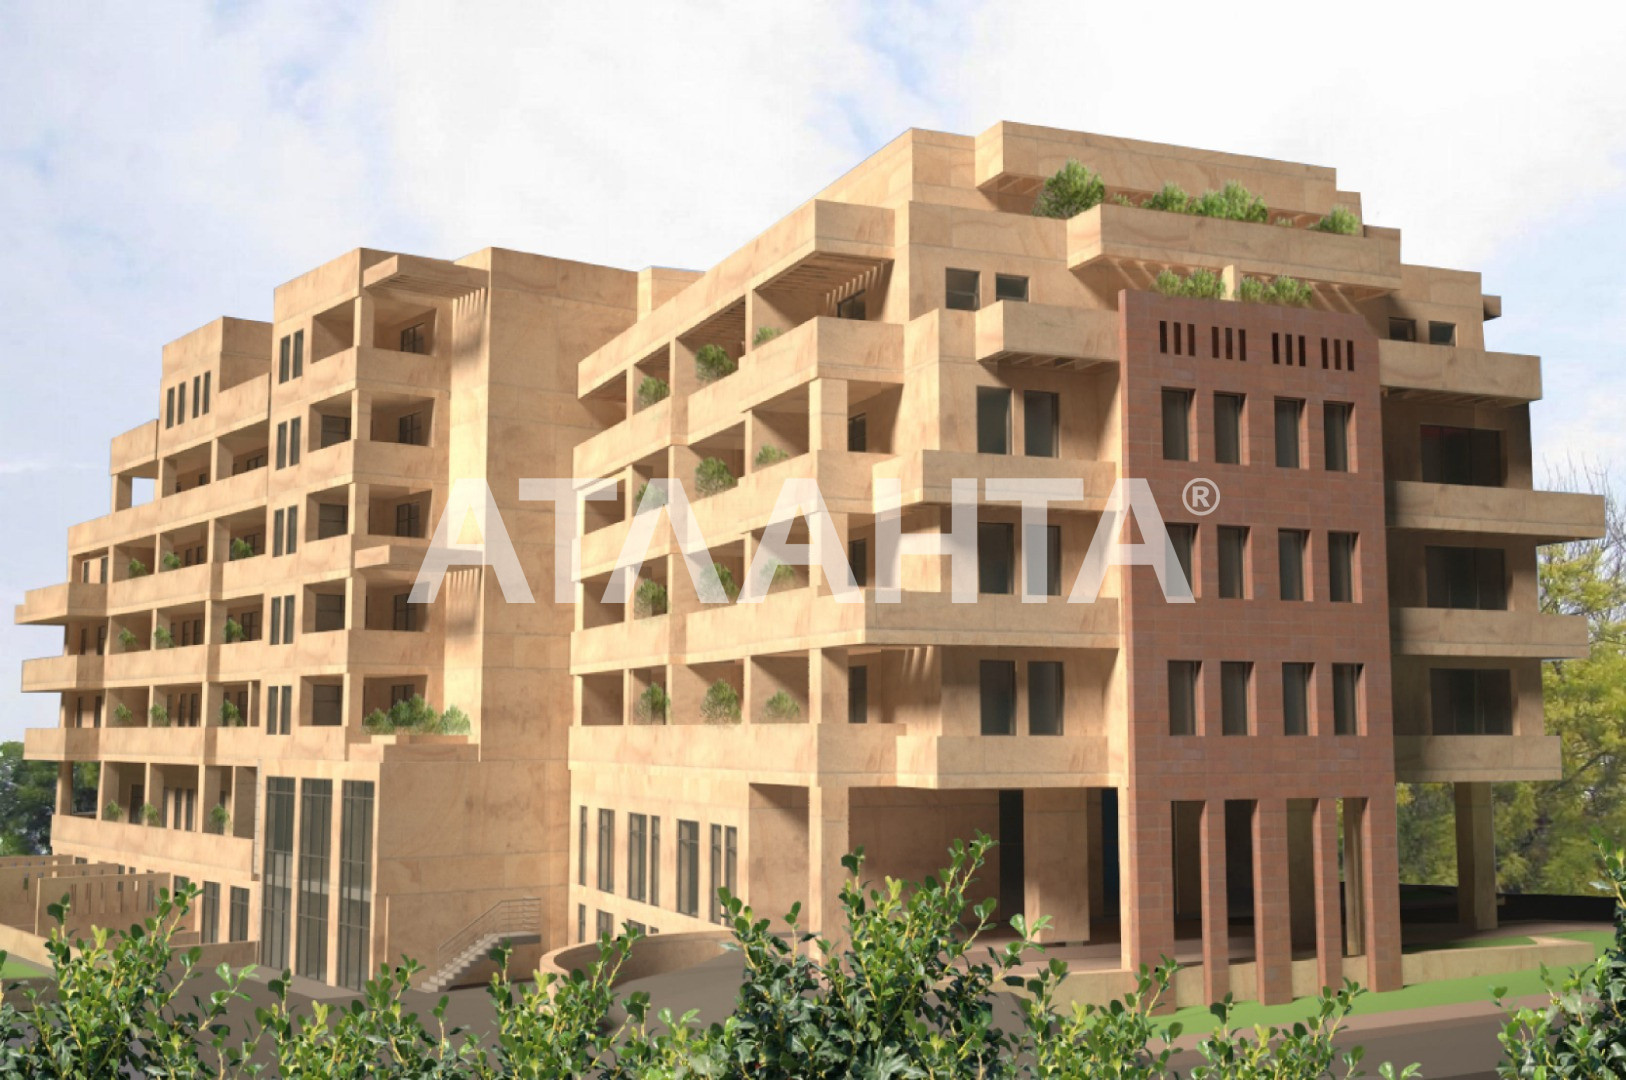 Продается 2-комнатная Квартира на ул. Каманина — 91 070 у.е.